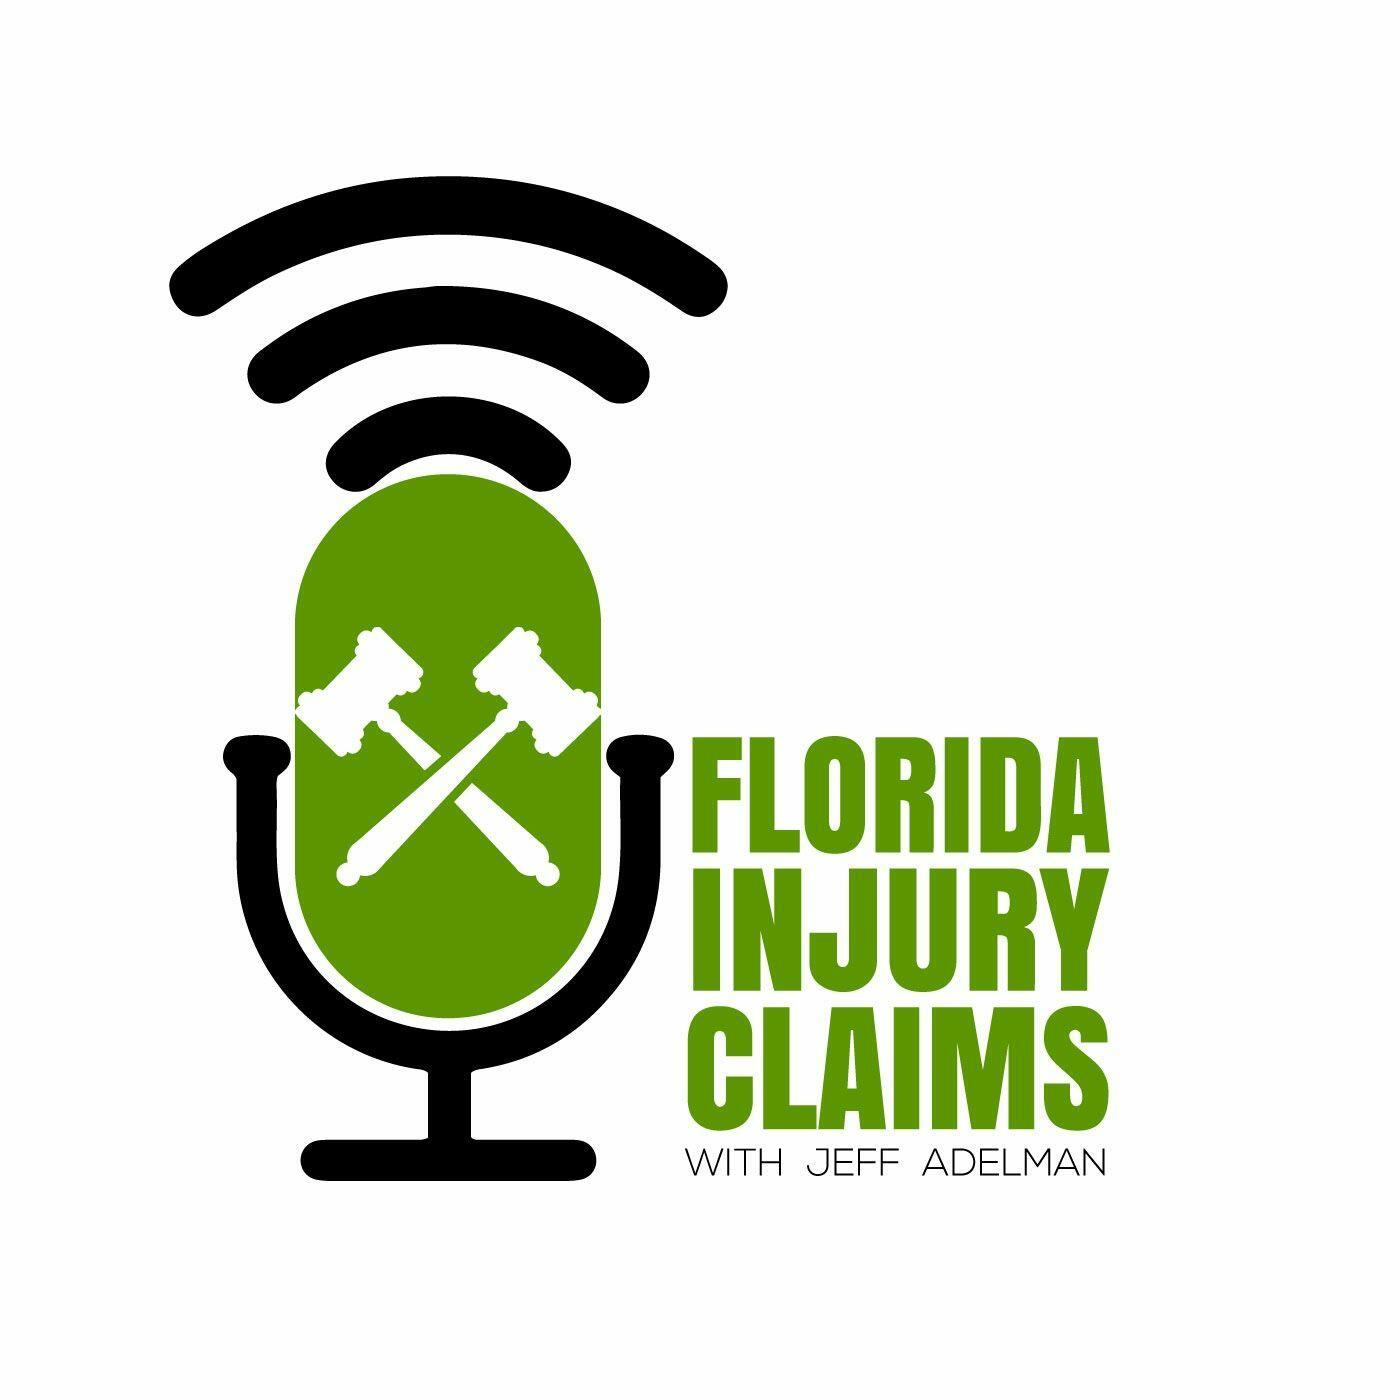 Florida Injury Claims With Jeff Adelman